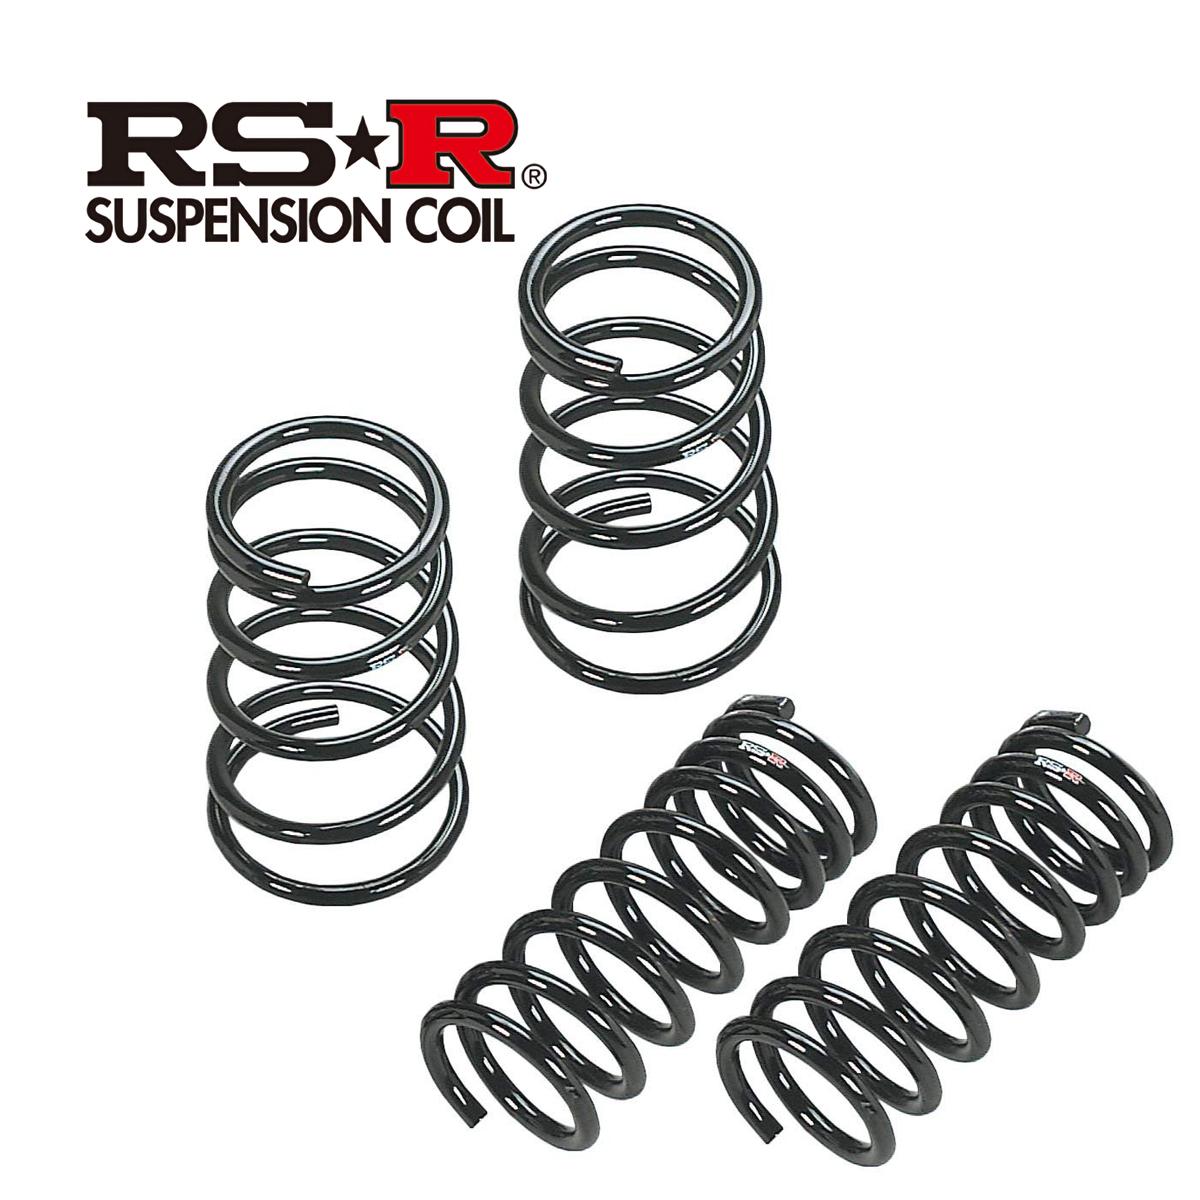 RS-R フリードハイブリッド 7人乗り GB7 ハイブリッド・Gホンダセンシング ダウンサス スプリング 1台分 H718W RSR ダウン RSR 個人宅発送追金有